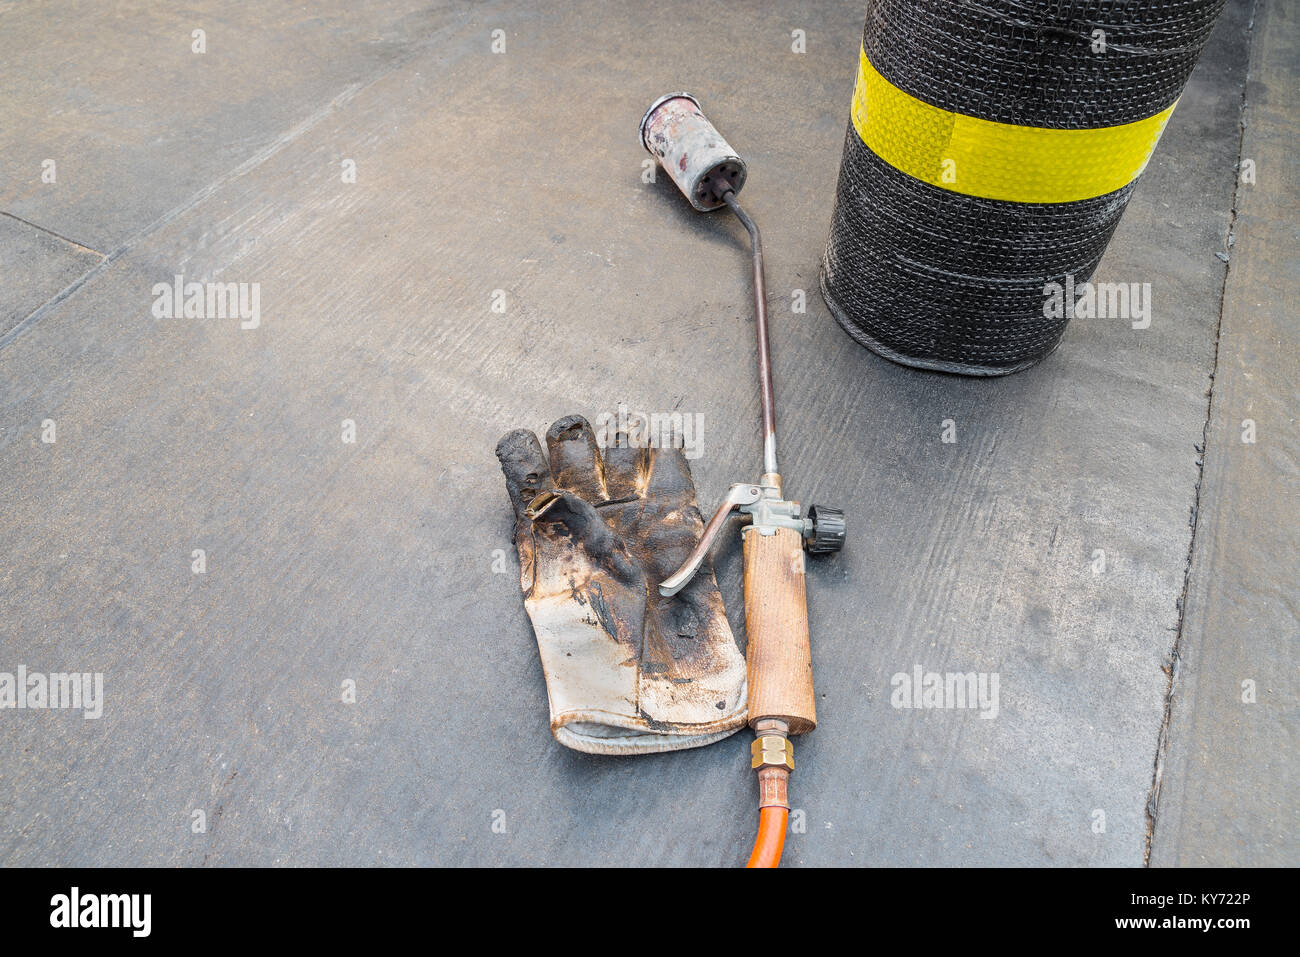 Roll of bituminous sheath, propane torch and glove resting on a bituminous membrane already laid - Stock Image